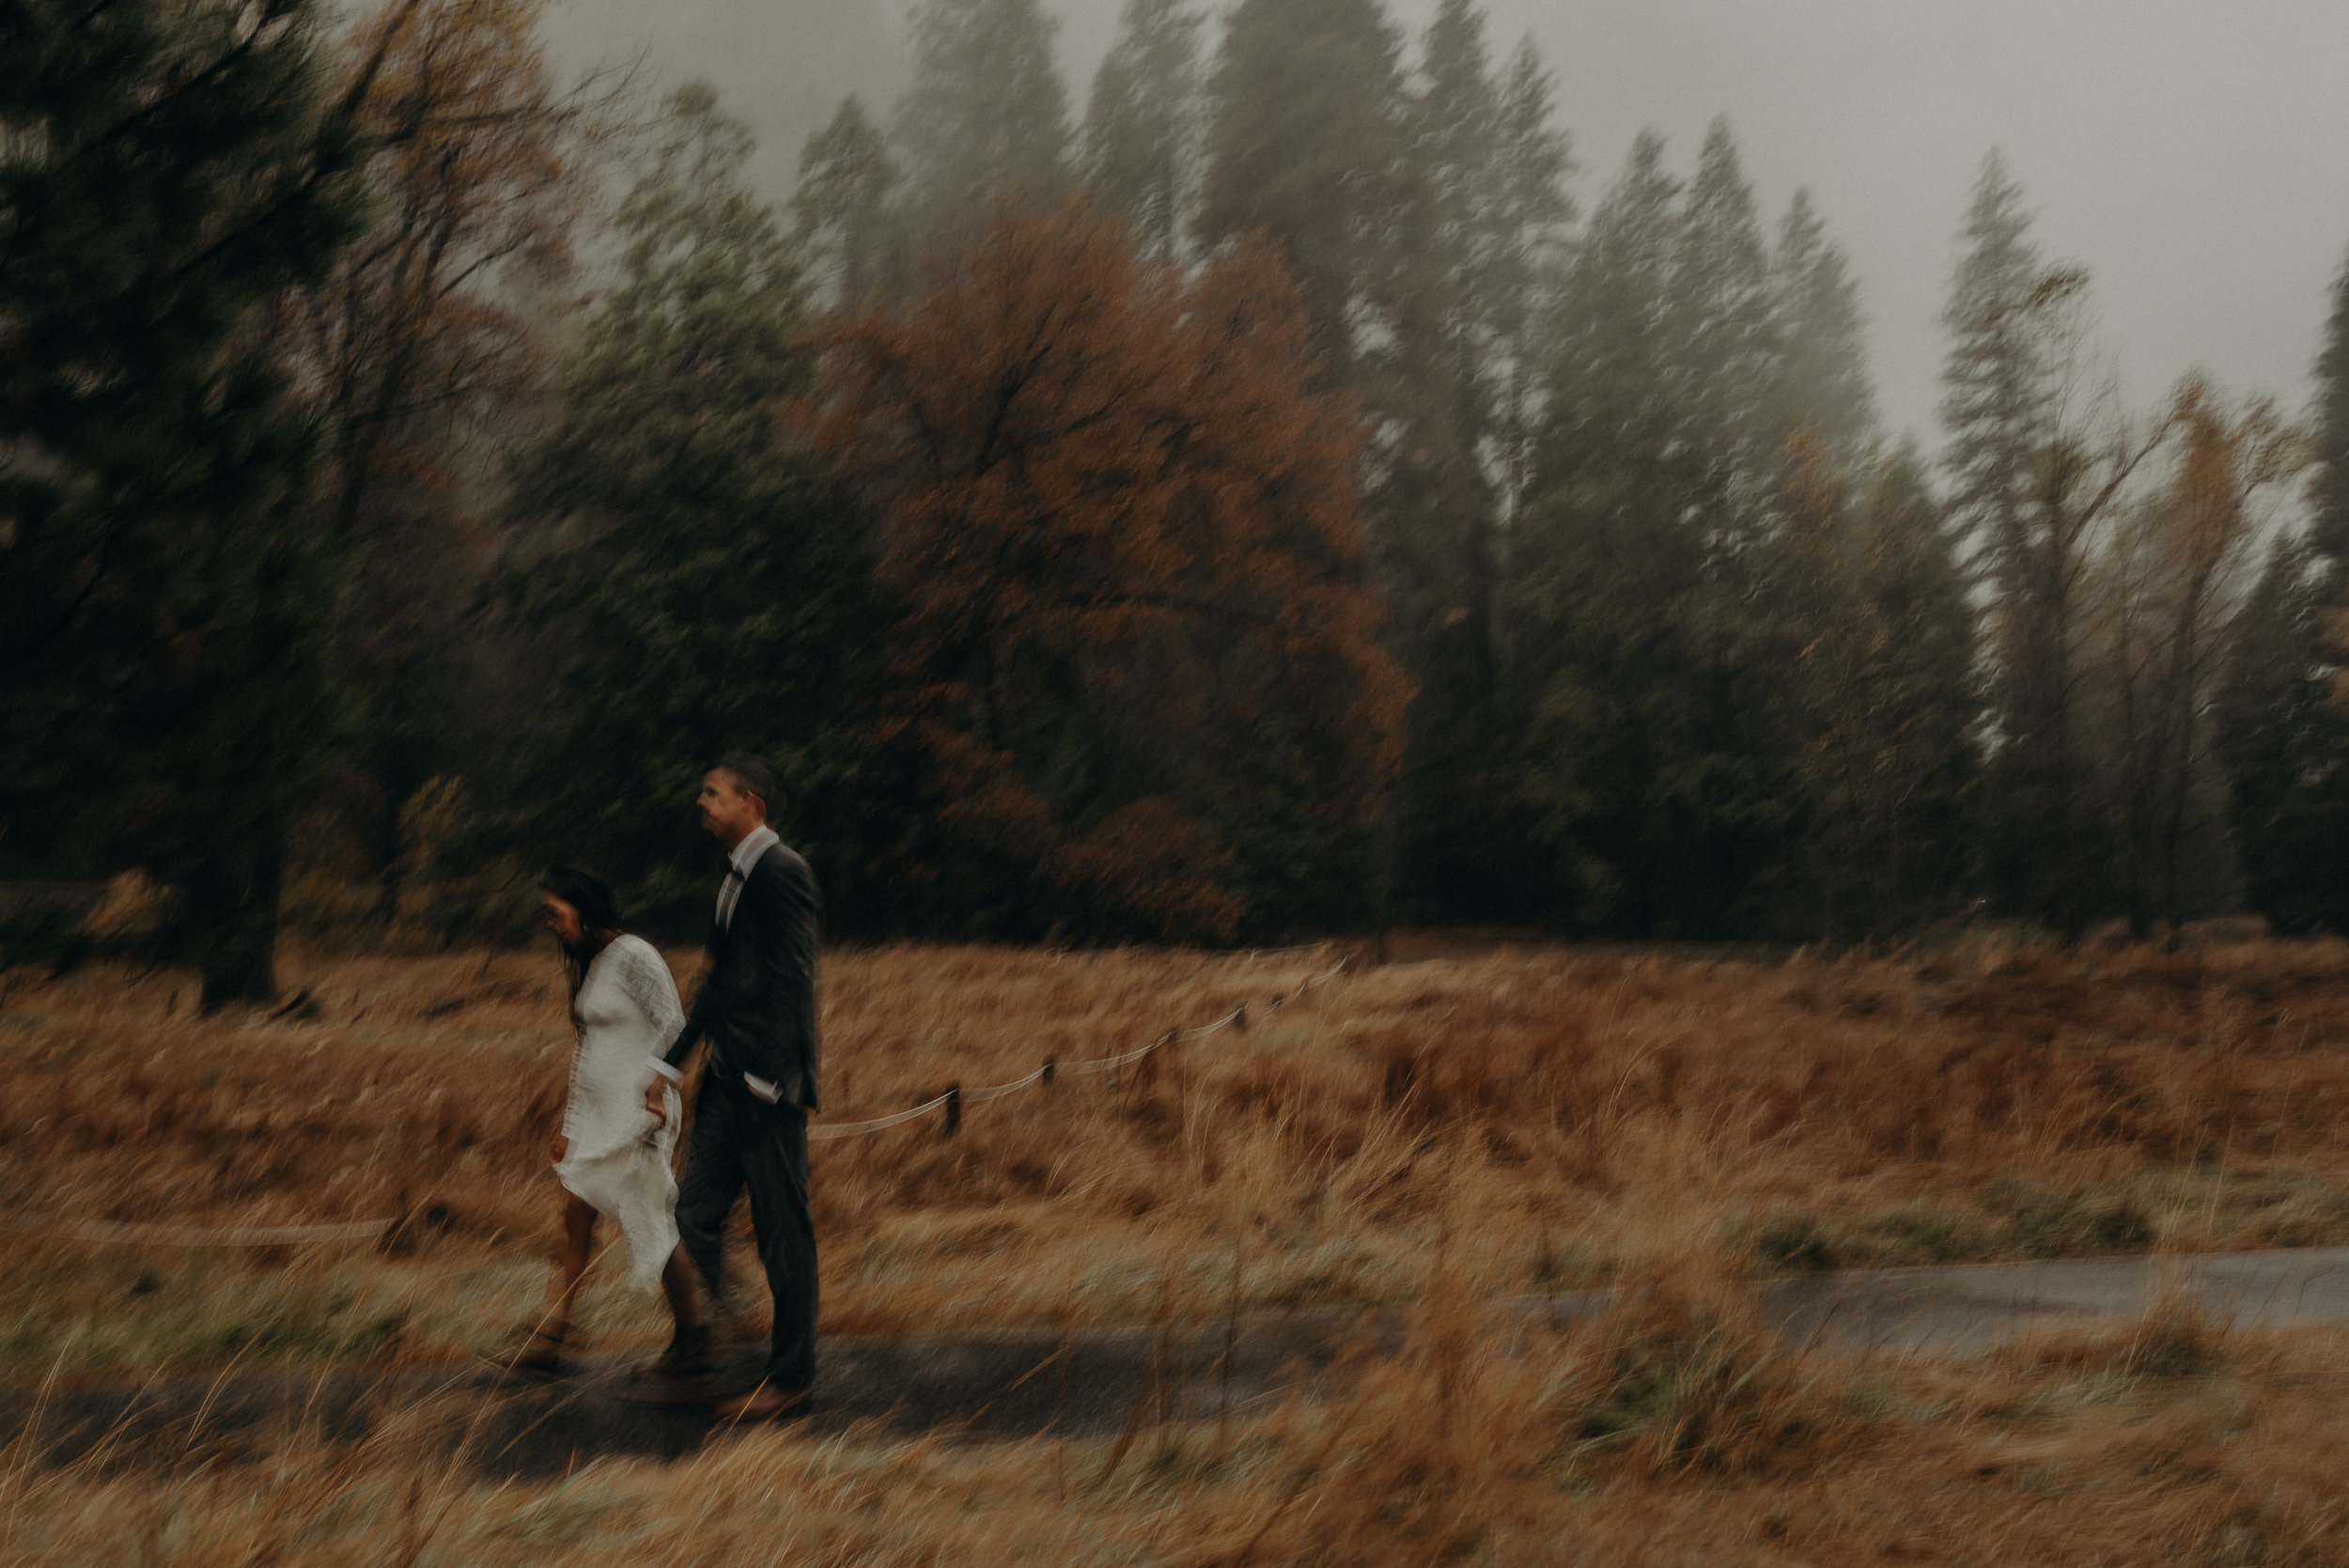 Isaiah + Taylor Photography - Yosemite Elopement - Los Angeles Wedding Photographer-82.jpg